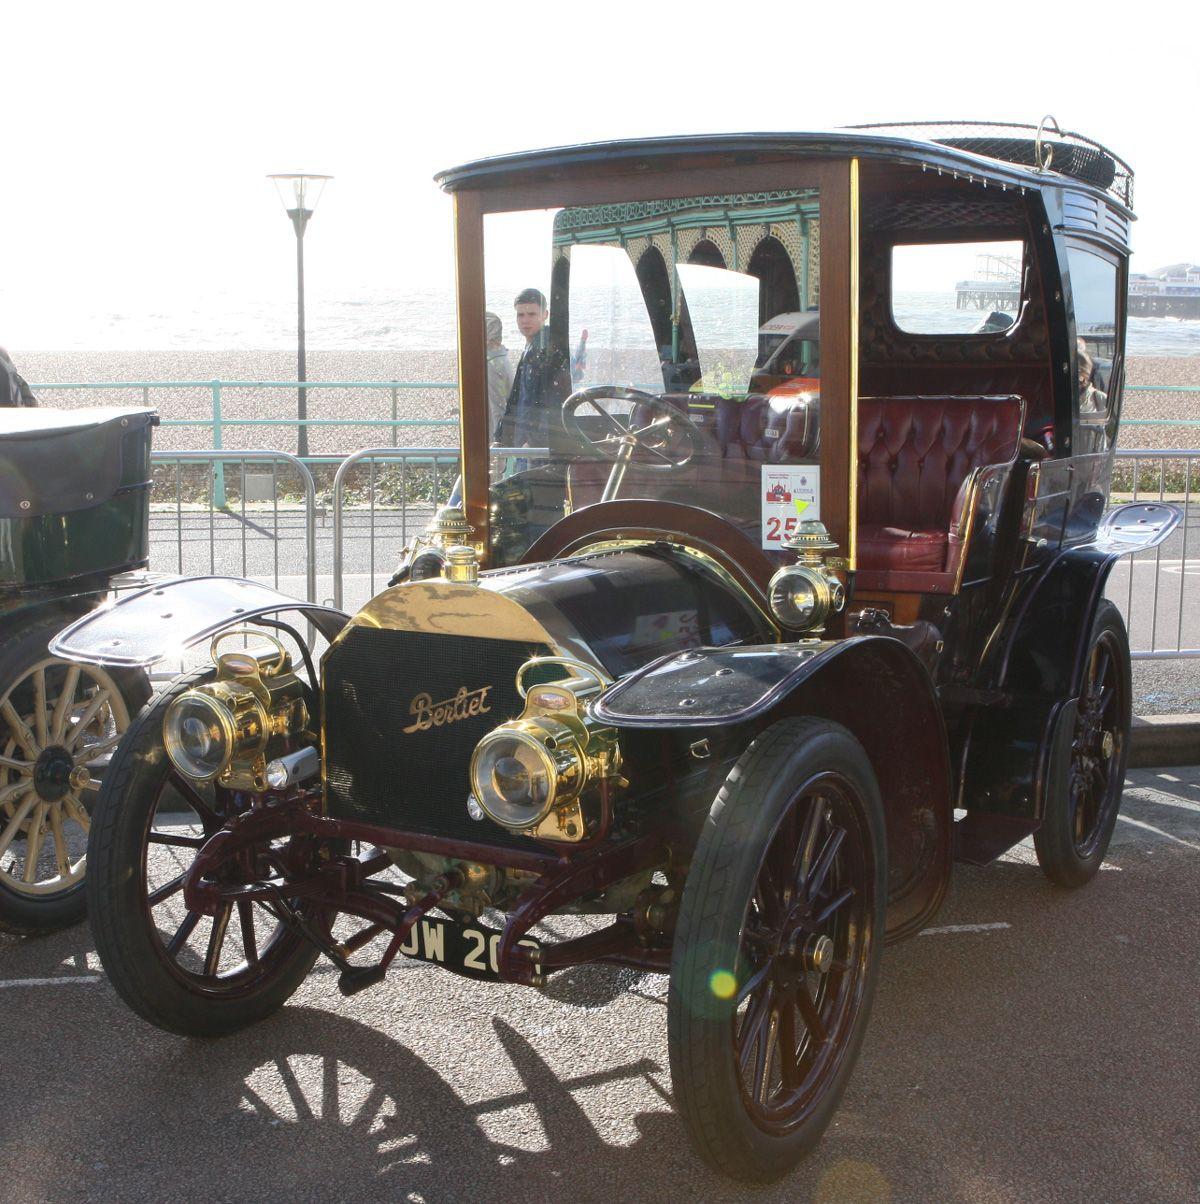 Mr Arturo Keller S 1903 4 Cylinder 20 Hp Closed Swing Seat Tonneau Bodied Berliet Antique Cars Vintage Cars Swing Seat